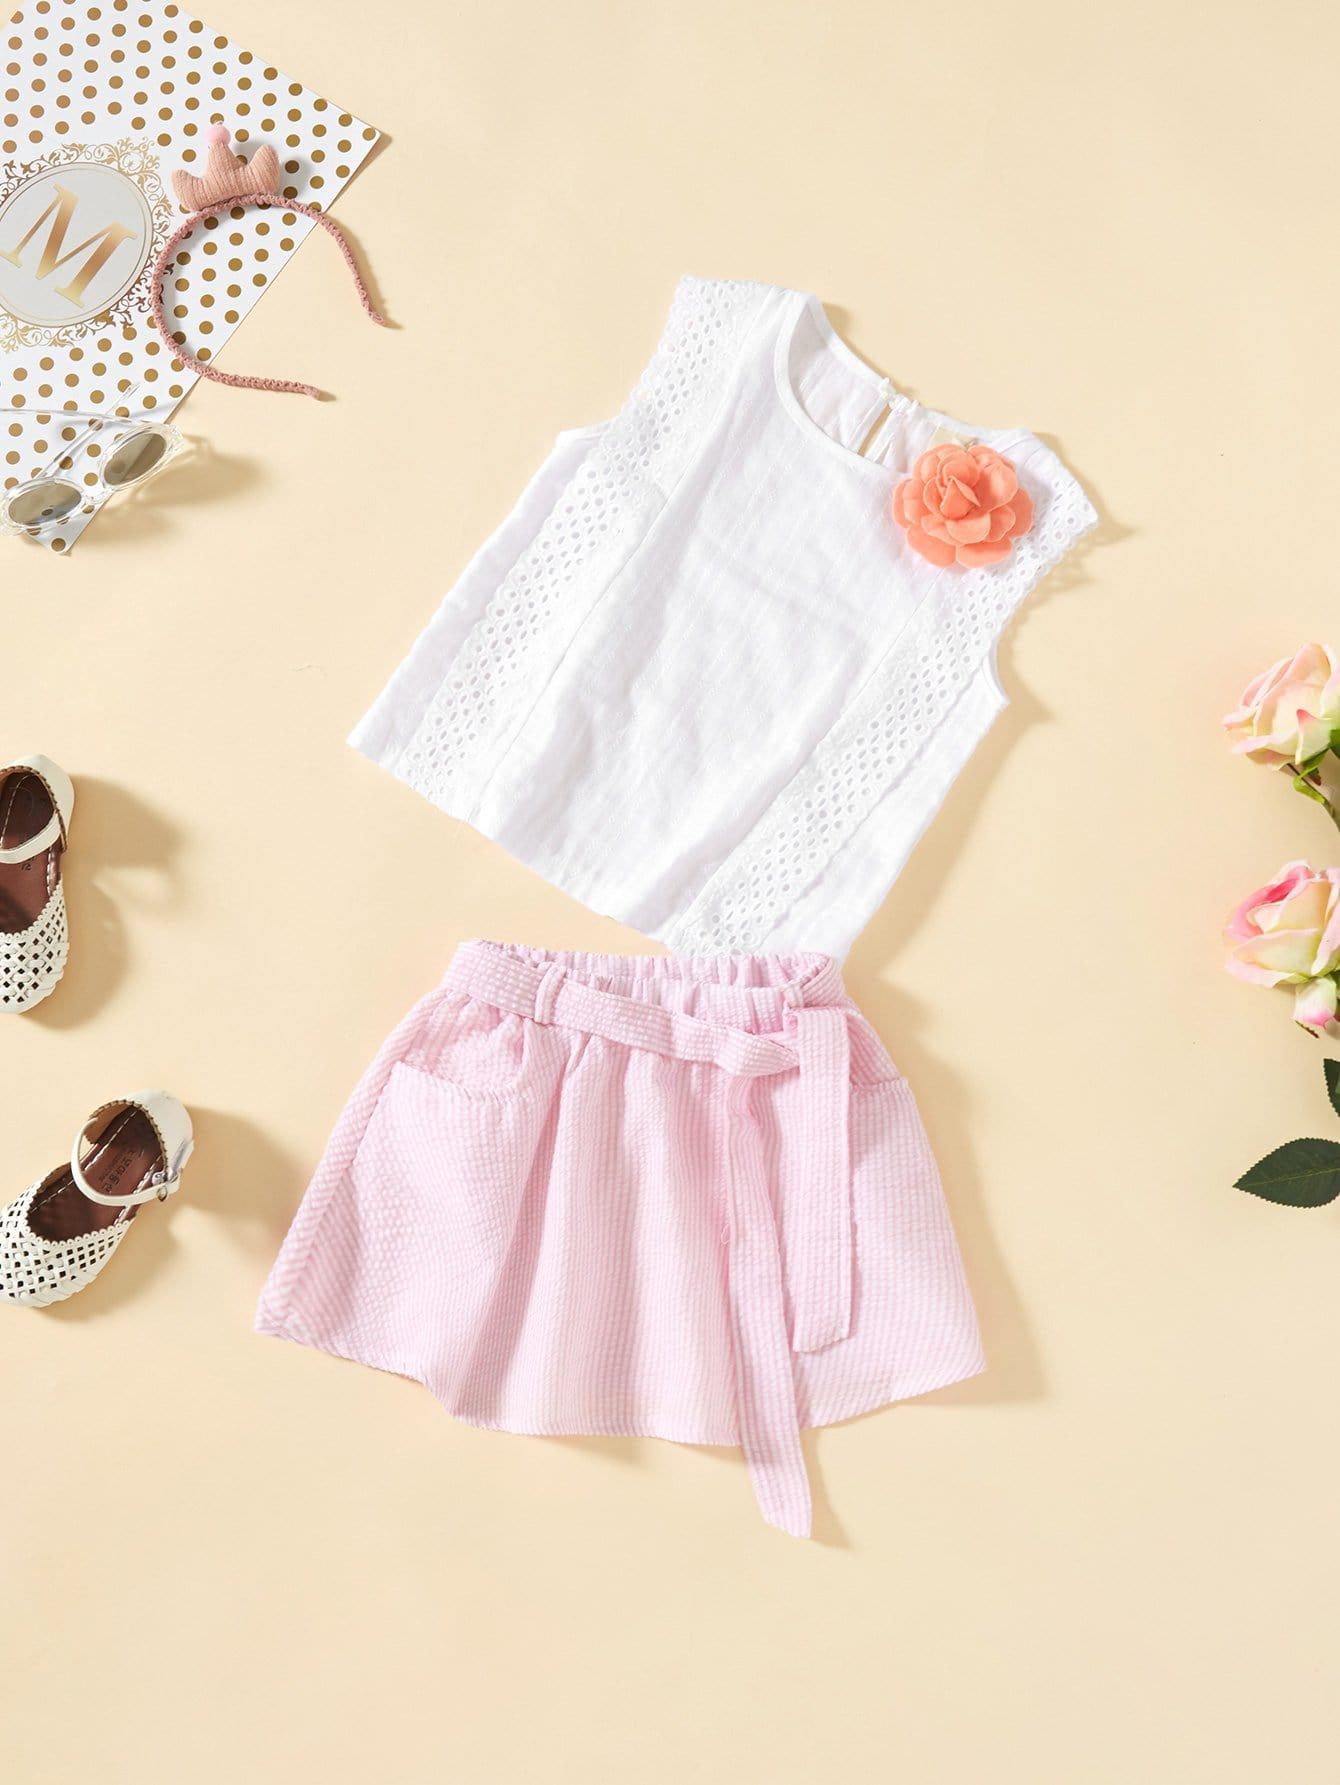 Girls Eyelet Embroidered Vest And Striped Skirt Set With Brooch fashion girls pet hand bag brooch set